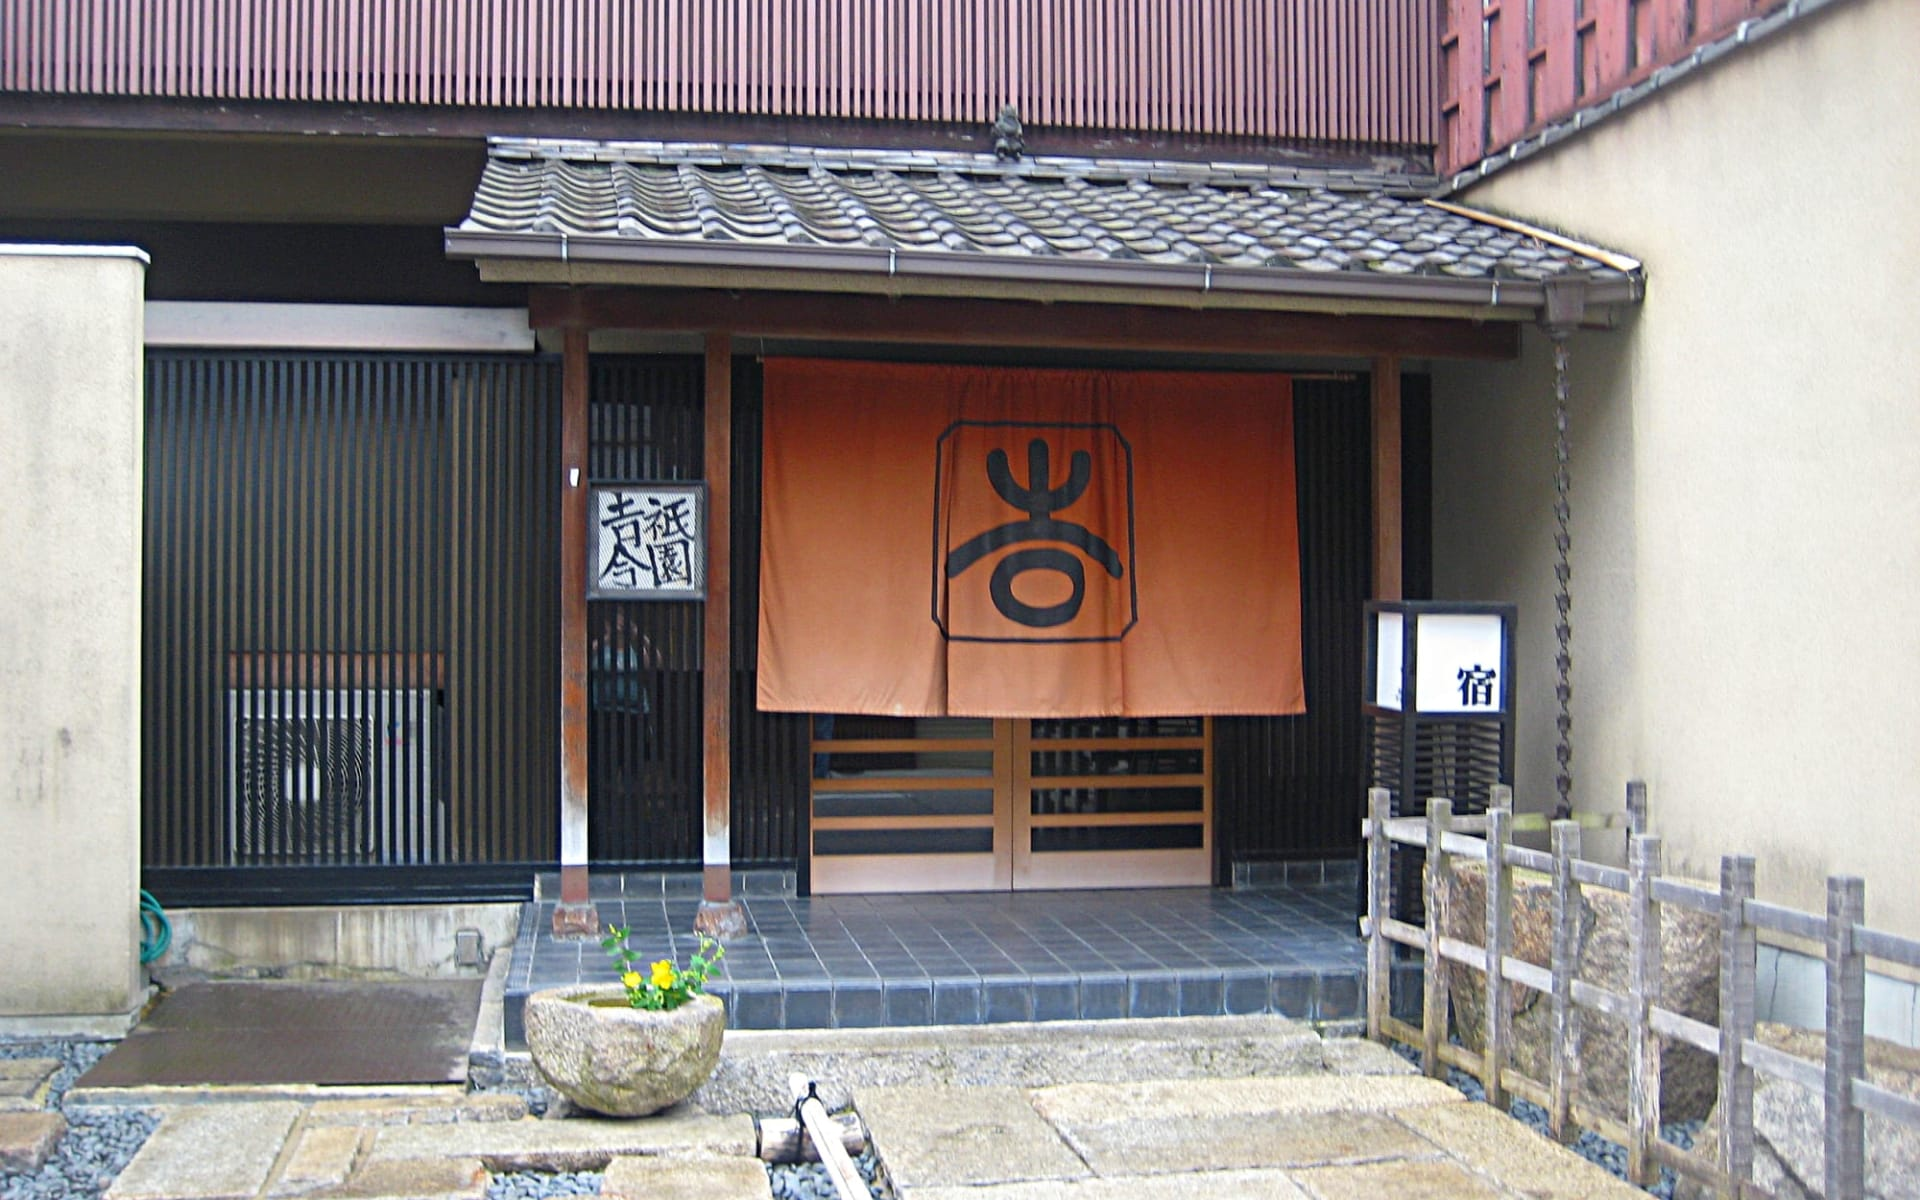 Gion Yoshi-ima Ryokan in Kyoto:  exterior